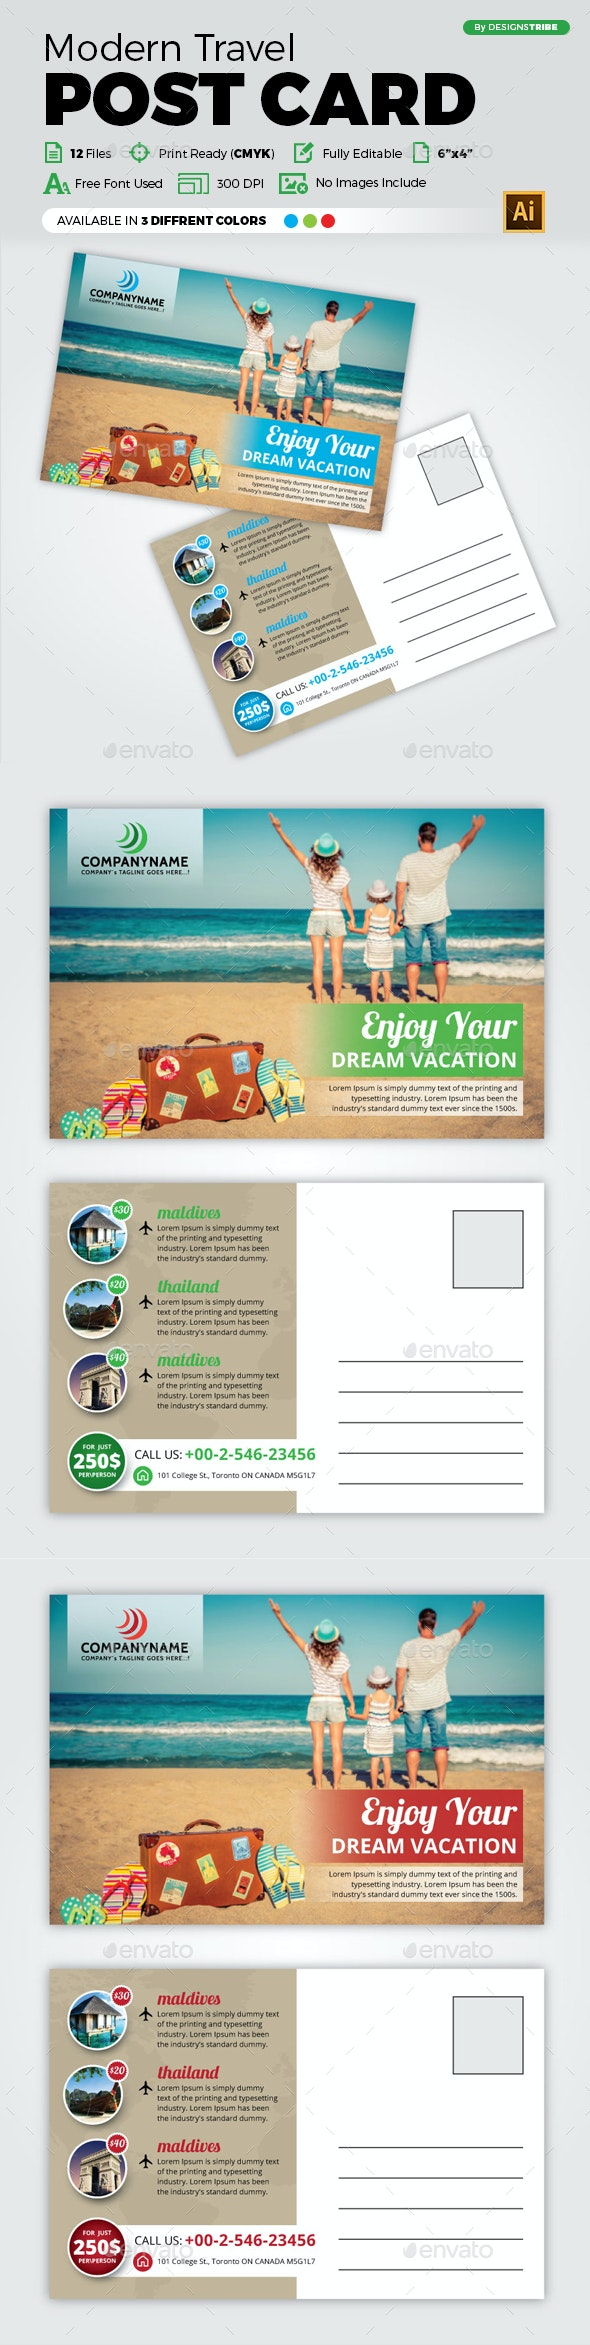 Travel Post Card Design - Cards & Invites Print Templates